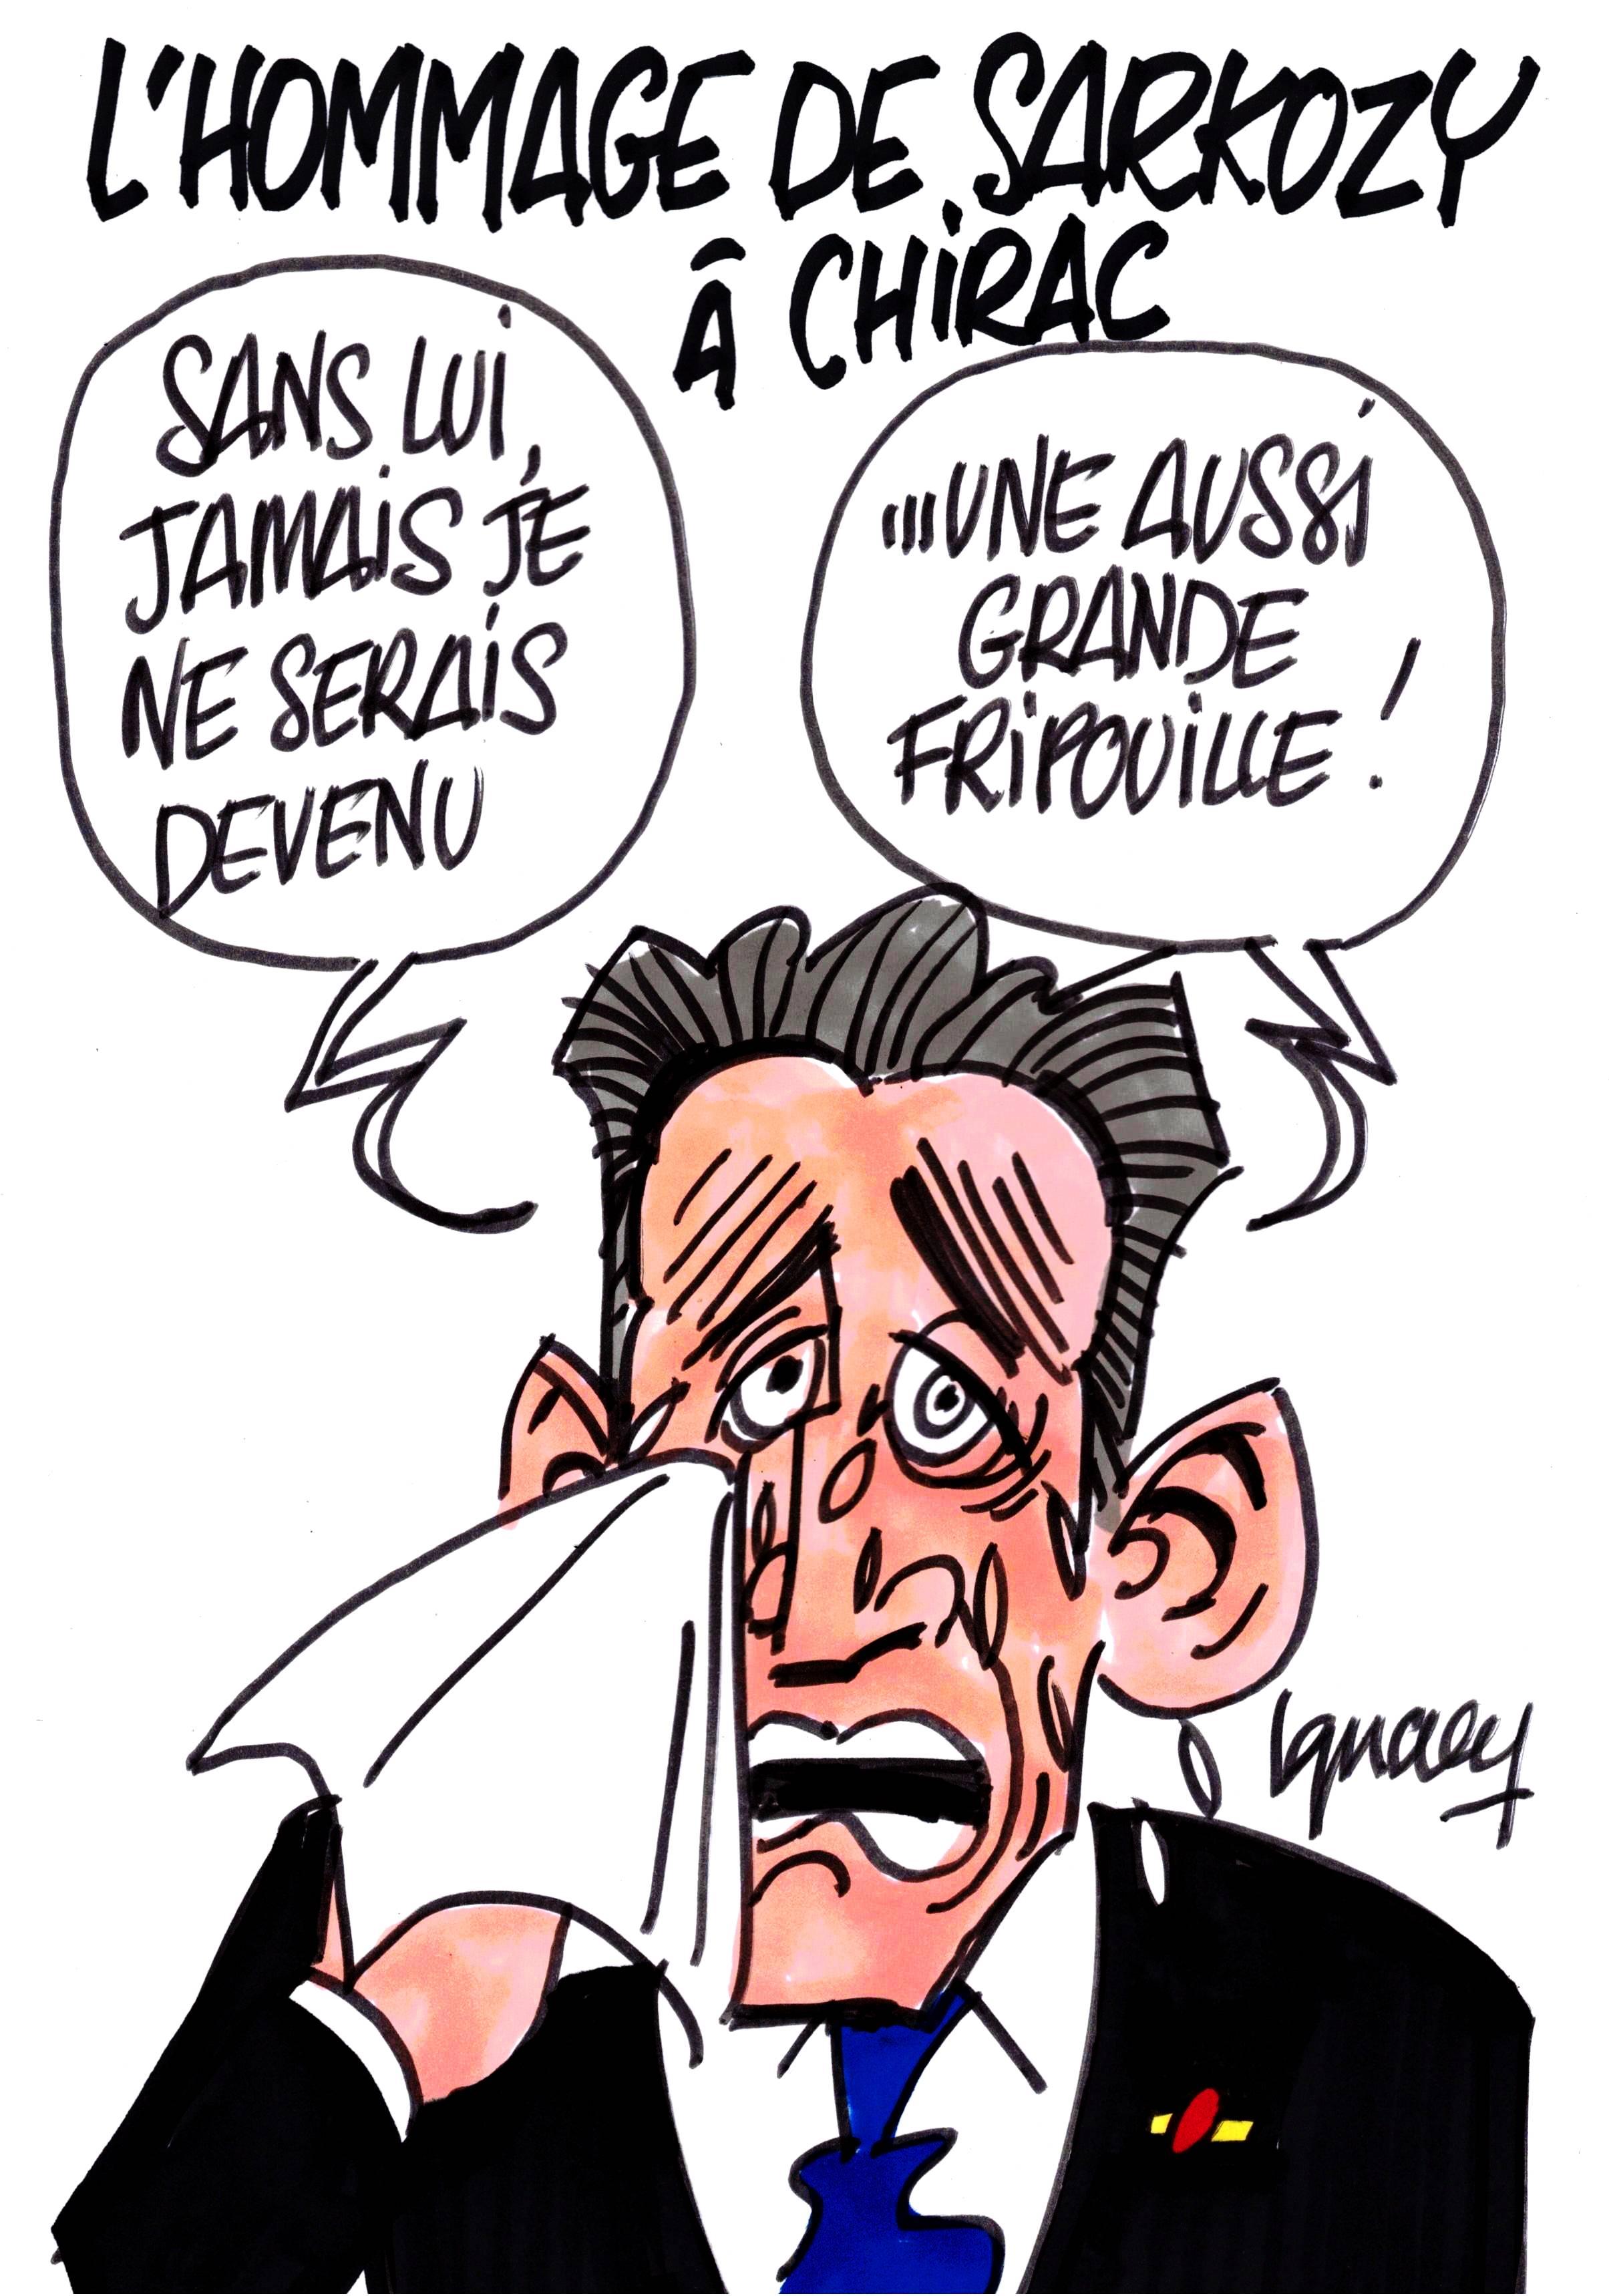 Ignace - Hommage de Sarkozy à Chirac